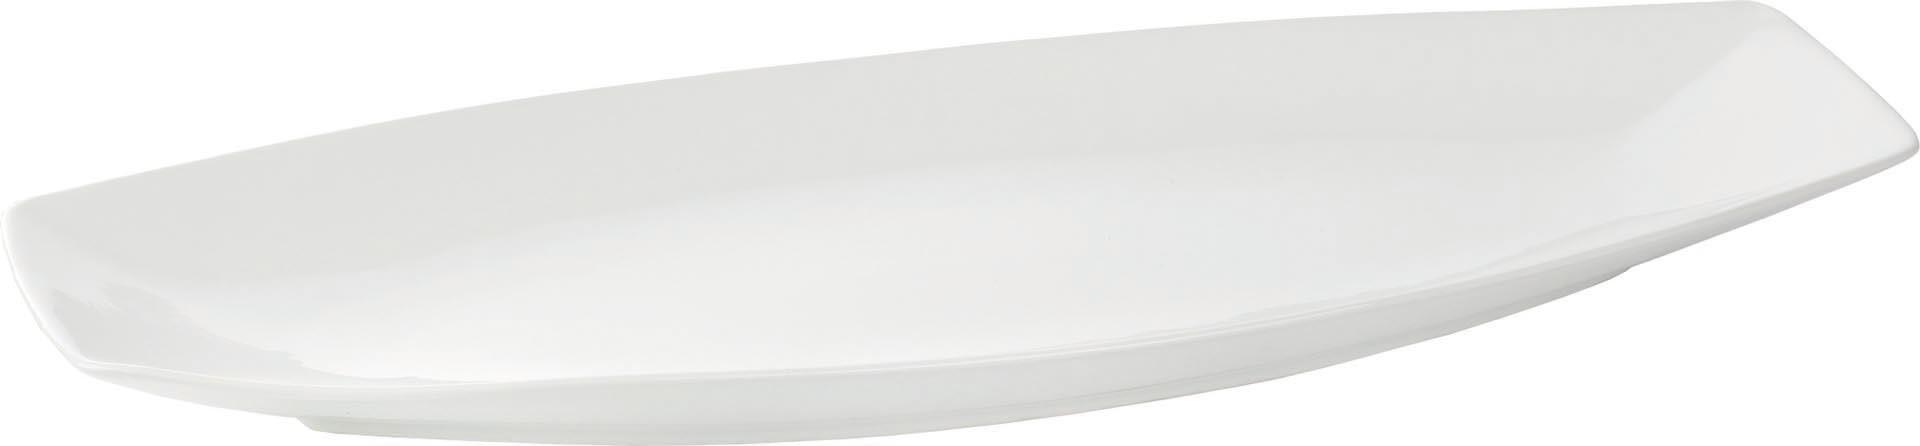 "Platte ""Convex"" 44,5 x 19 cm"